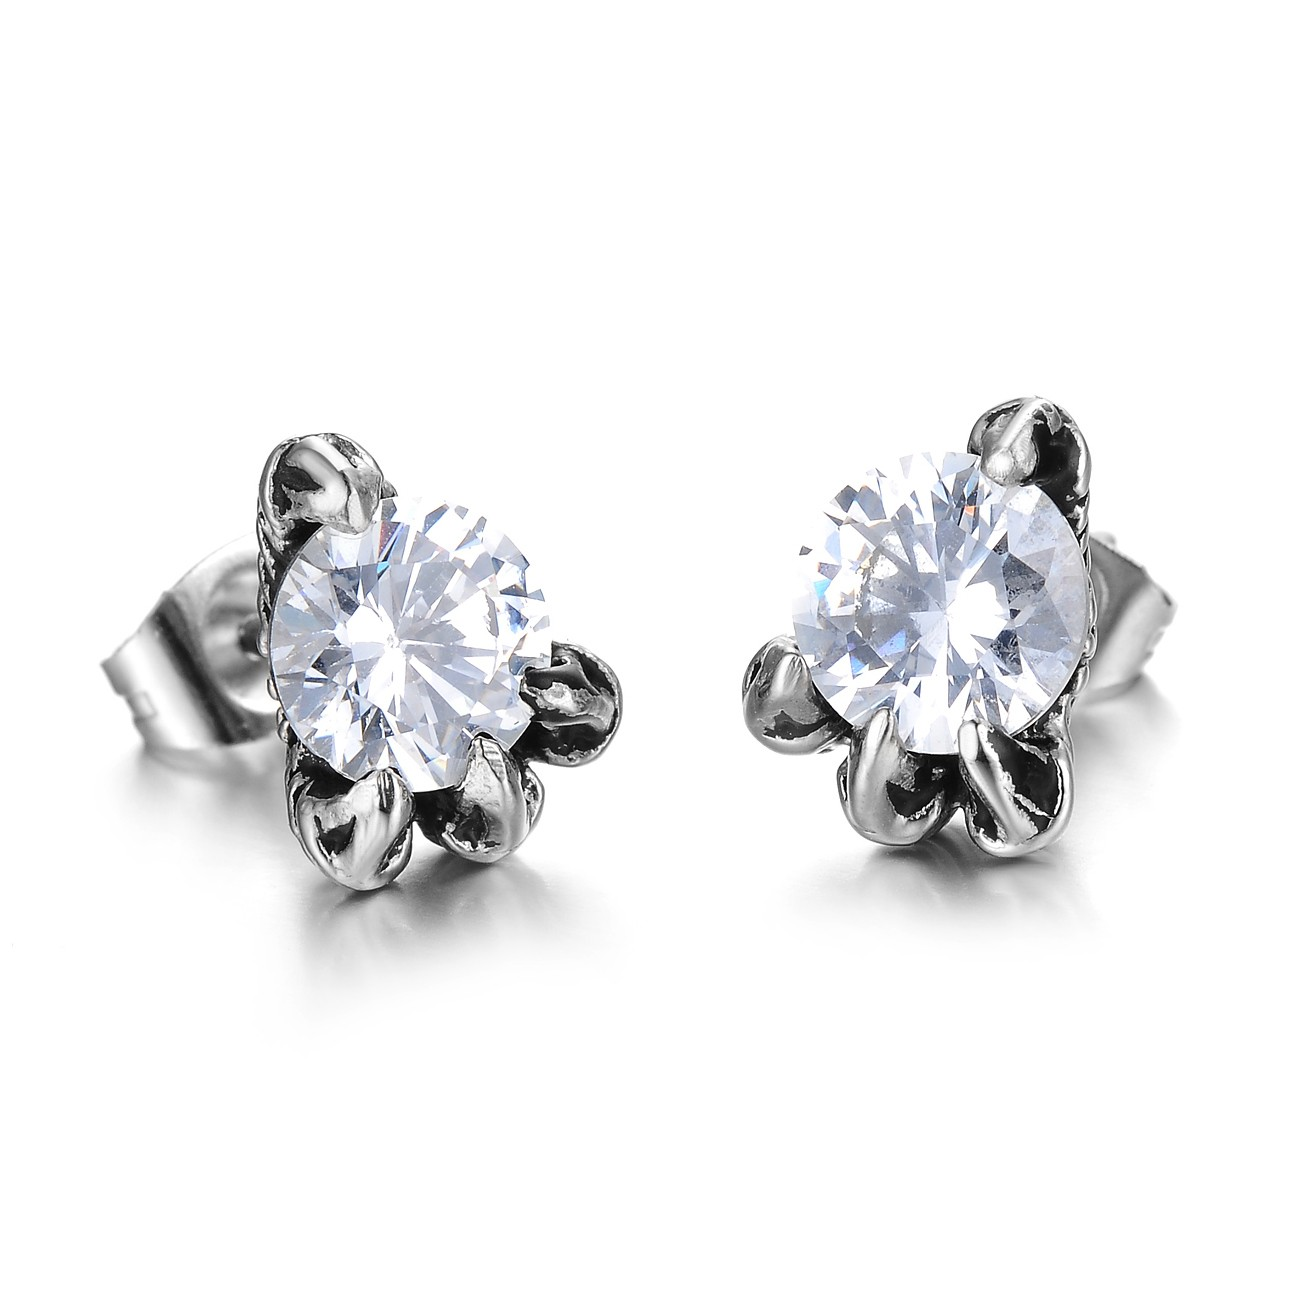 Diamond youth party stud earrings